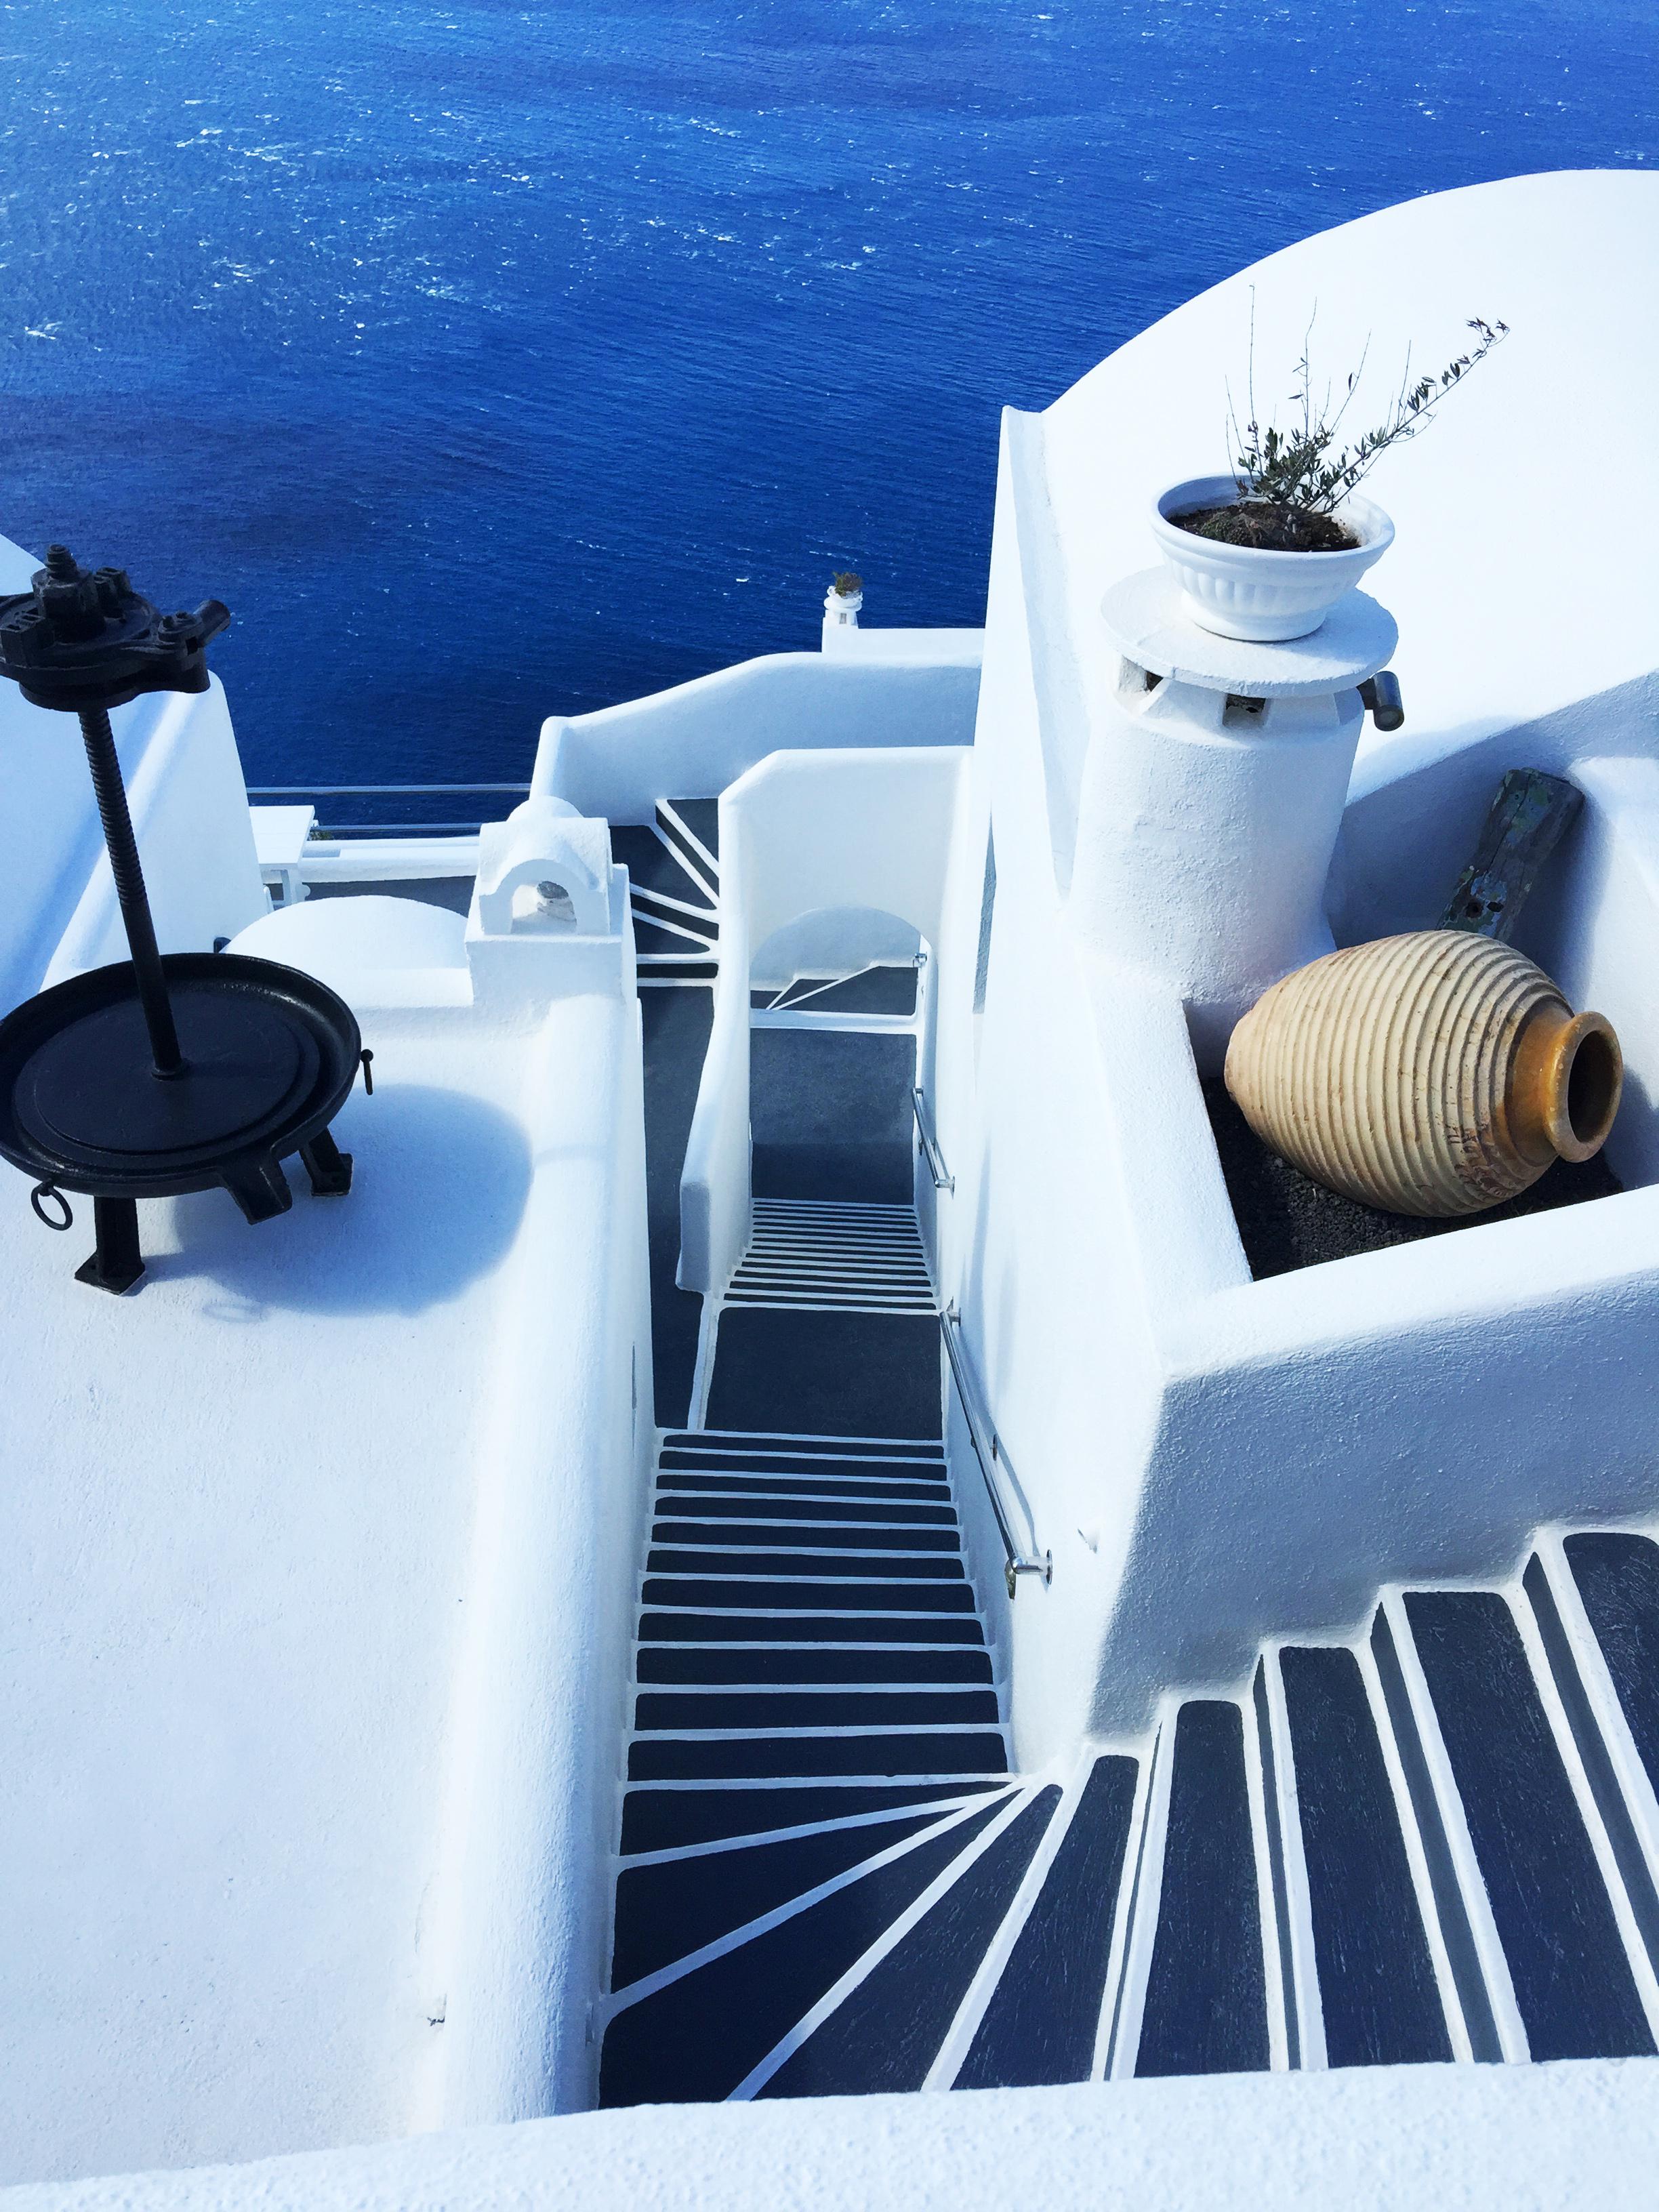 Santorin escaliers Grèce